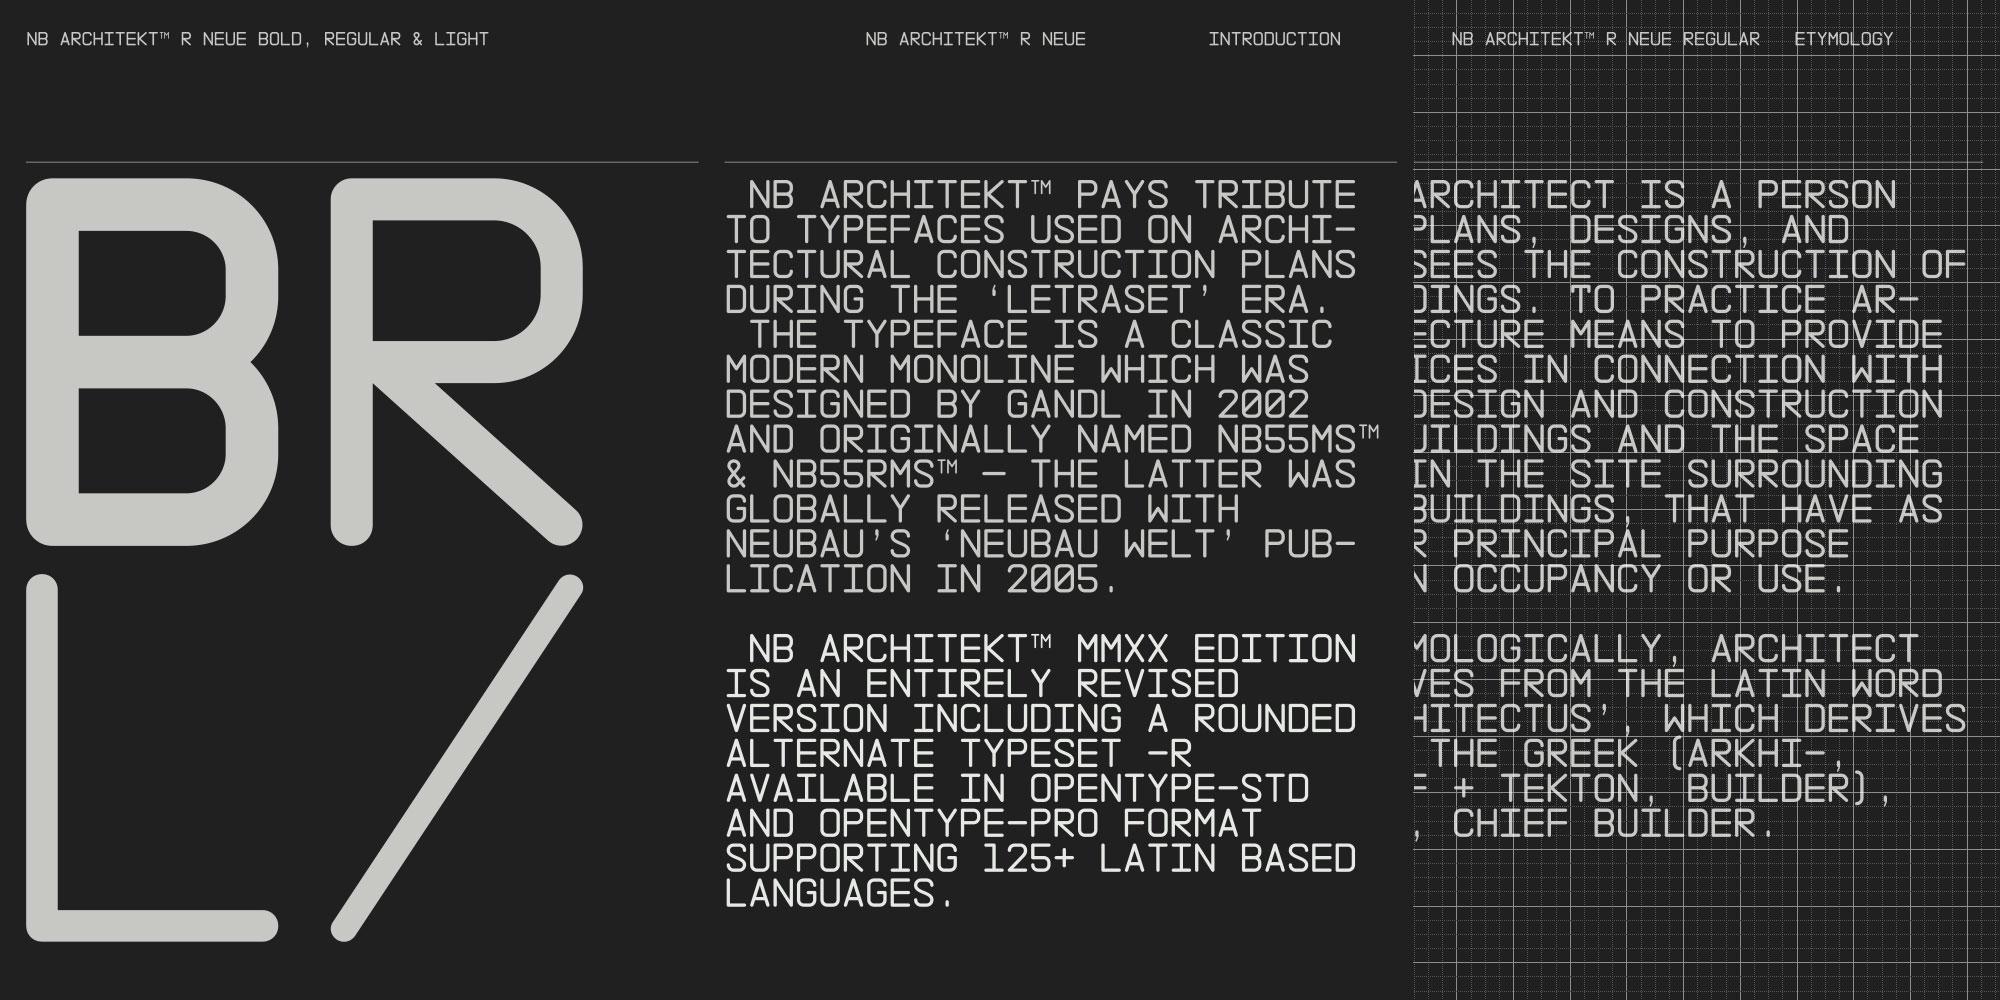 NBL_NB_Architekt_ED_MMXX_BRL_R_NEUE